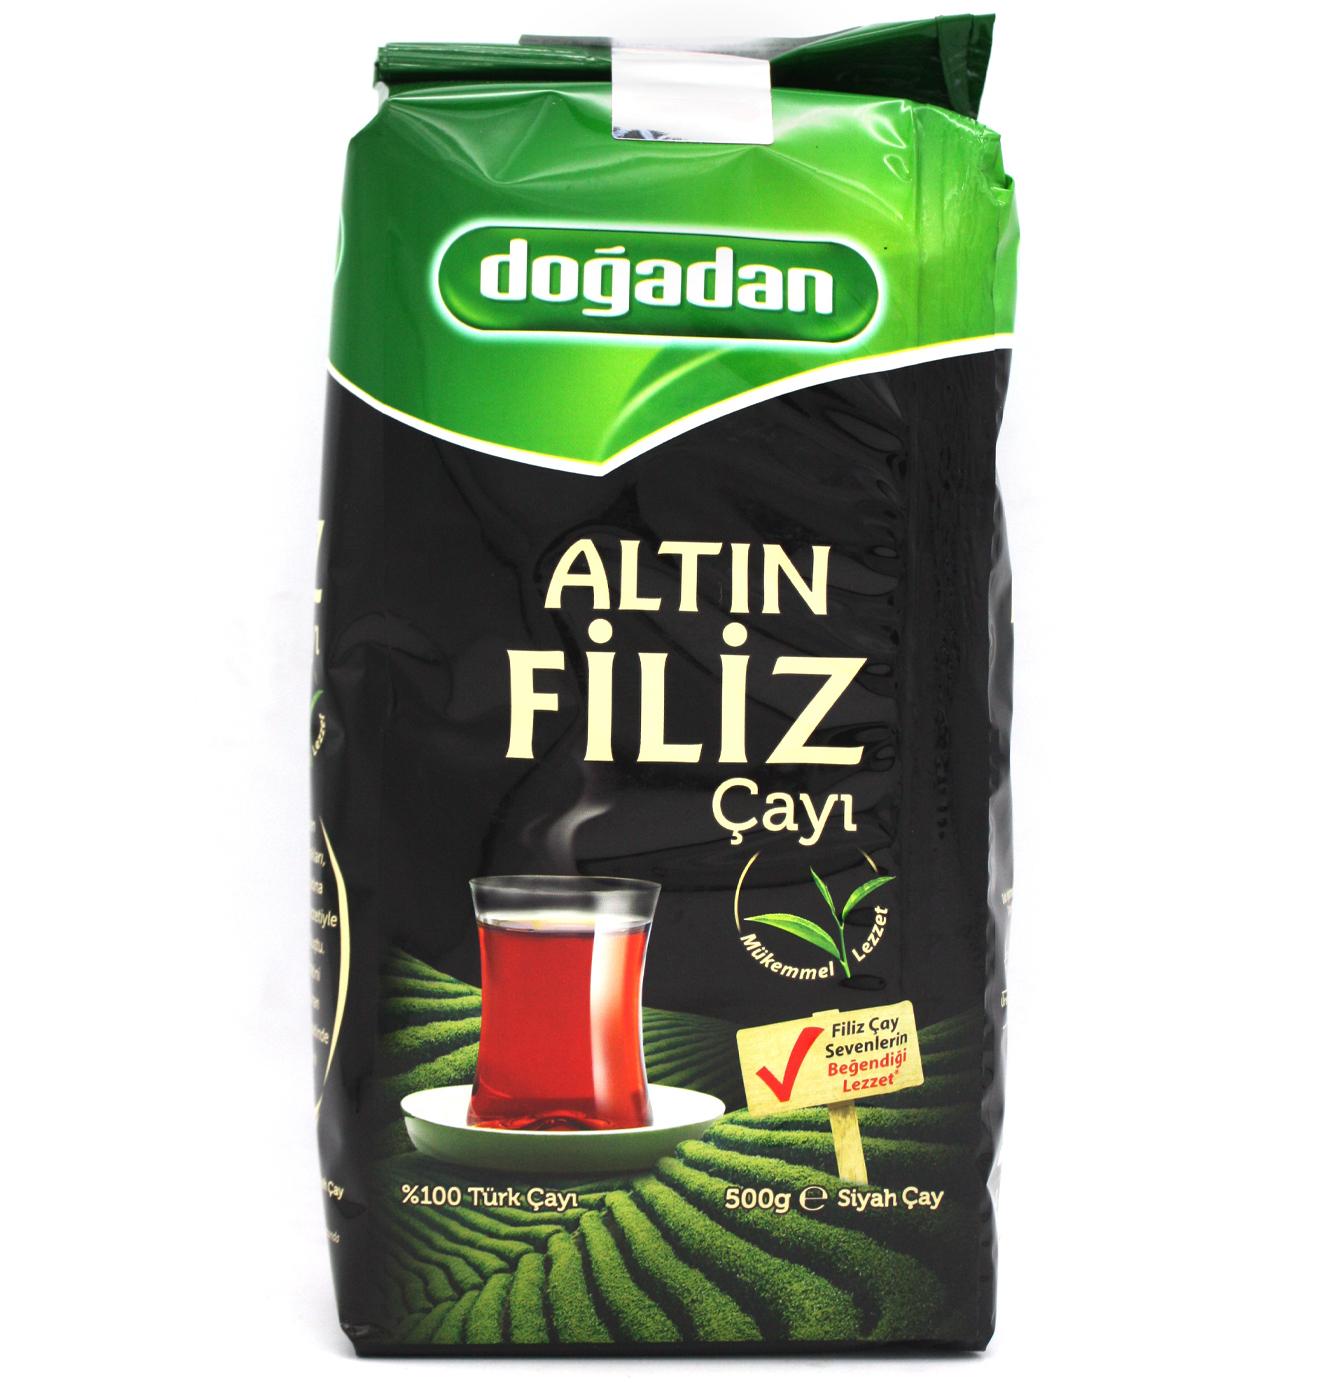 Чай Турецкий черный чай Altin Filiz, Dogadan, 500 г import_files_40_40f06b2069be11e9a9ac484d7ecee297_40f06b2369be11e9a9ac484d7ecee297.jpg